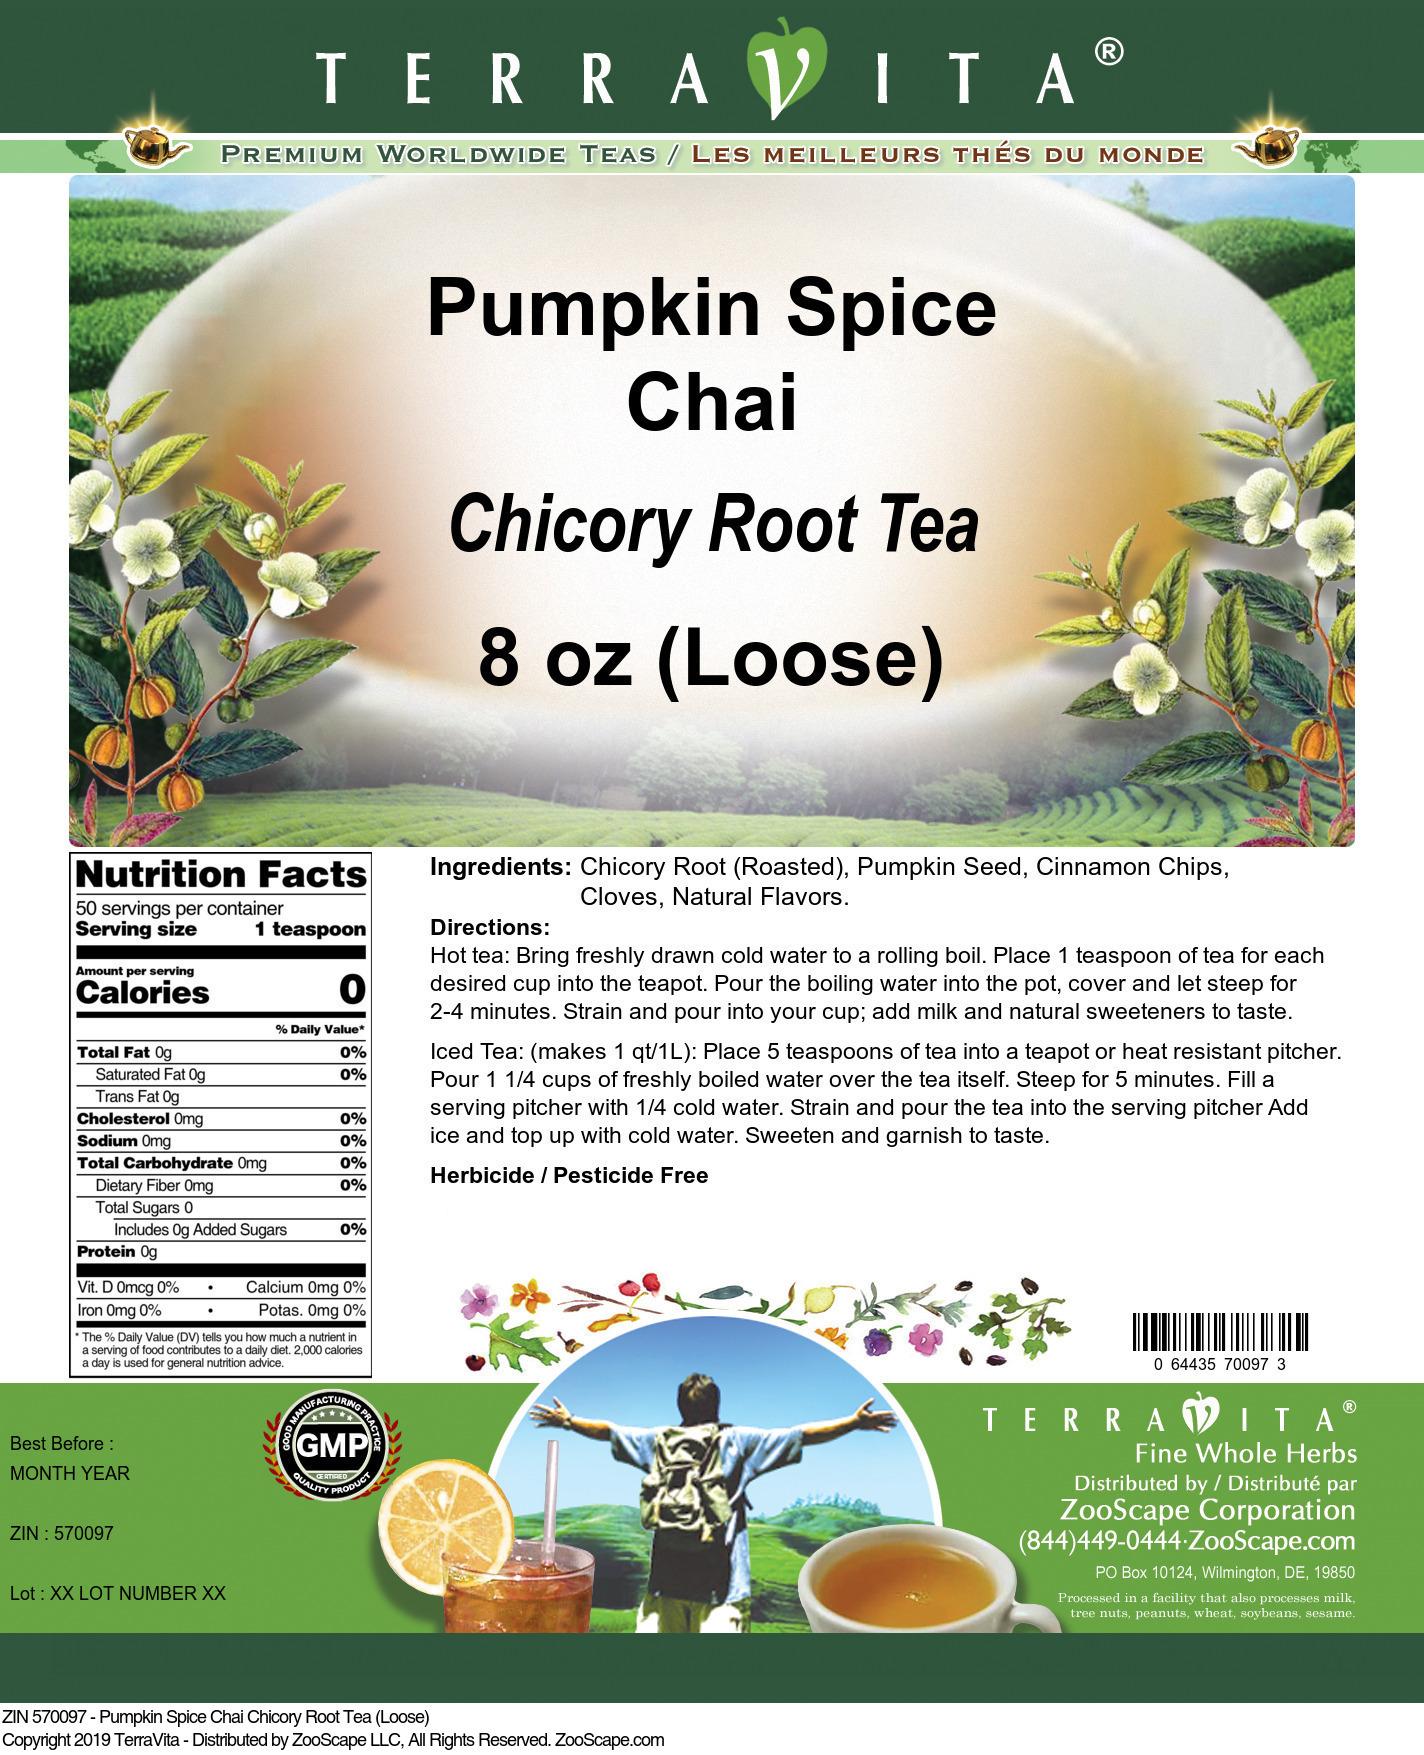 Pumpkin Spice Chai Chicory Root Tea (Loose)